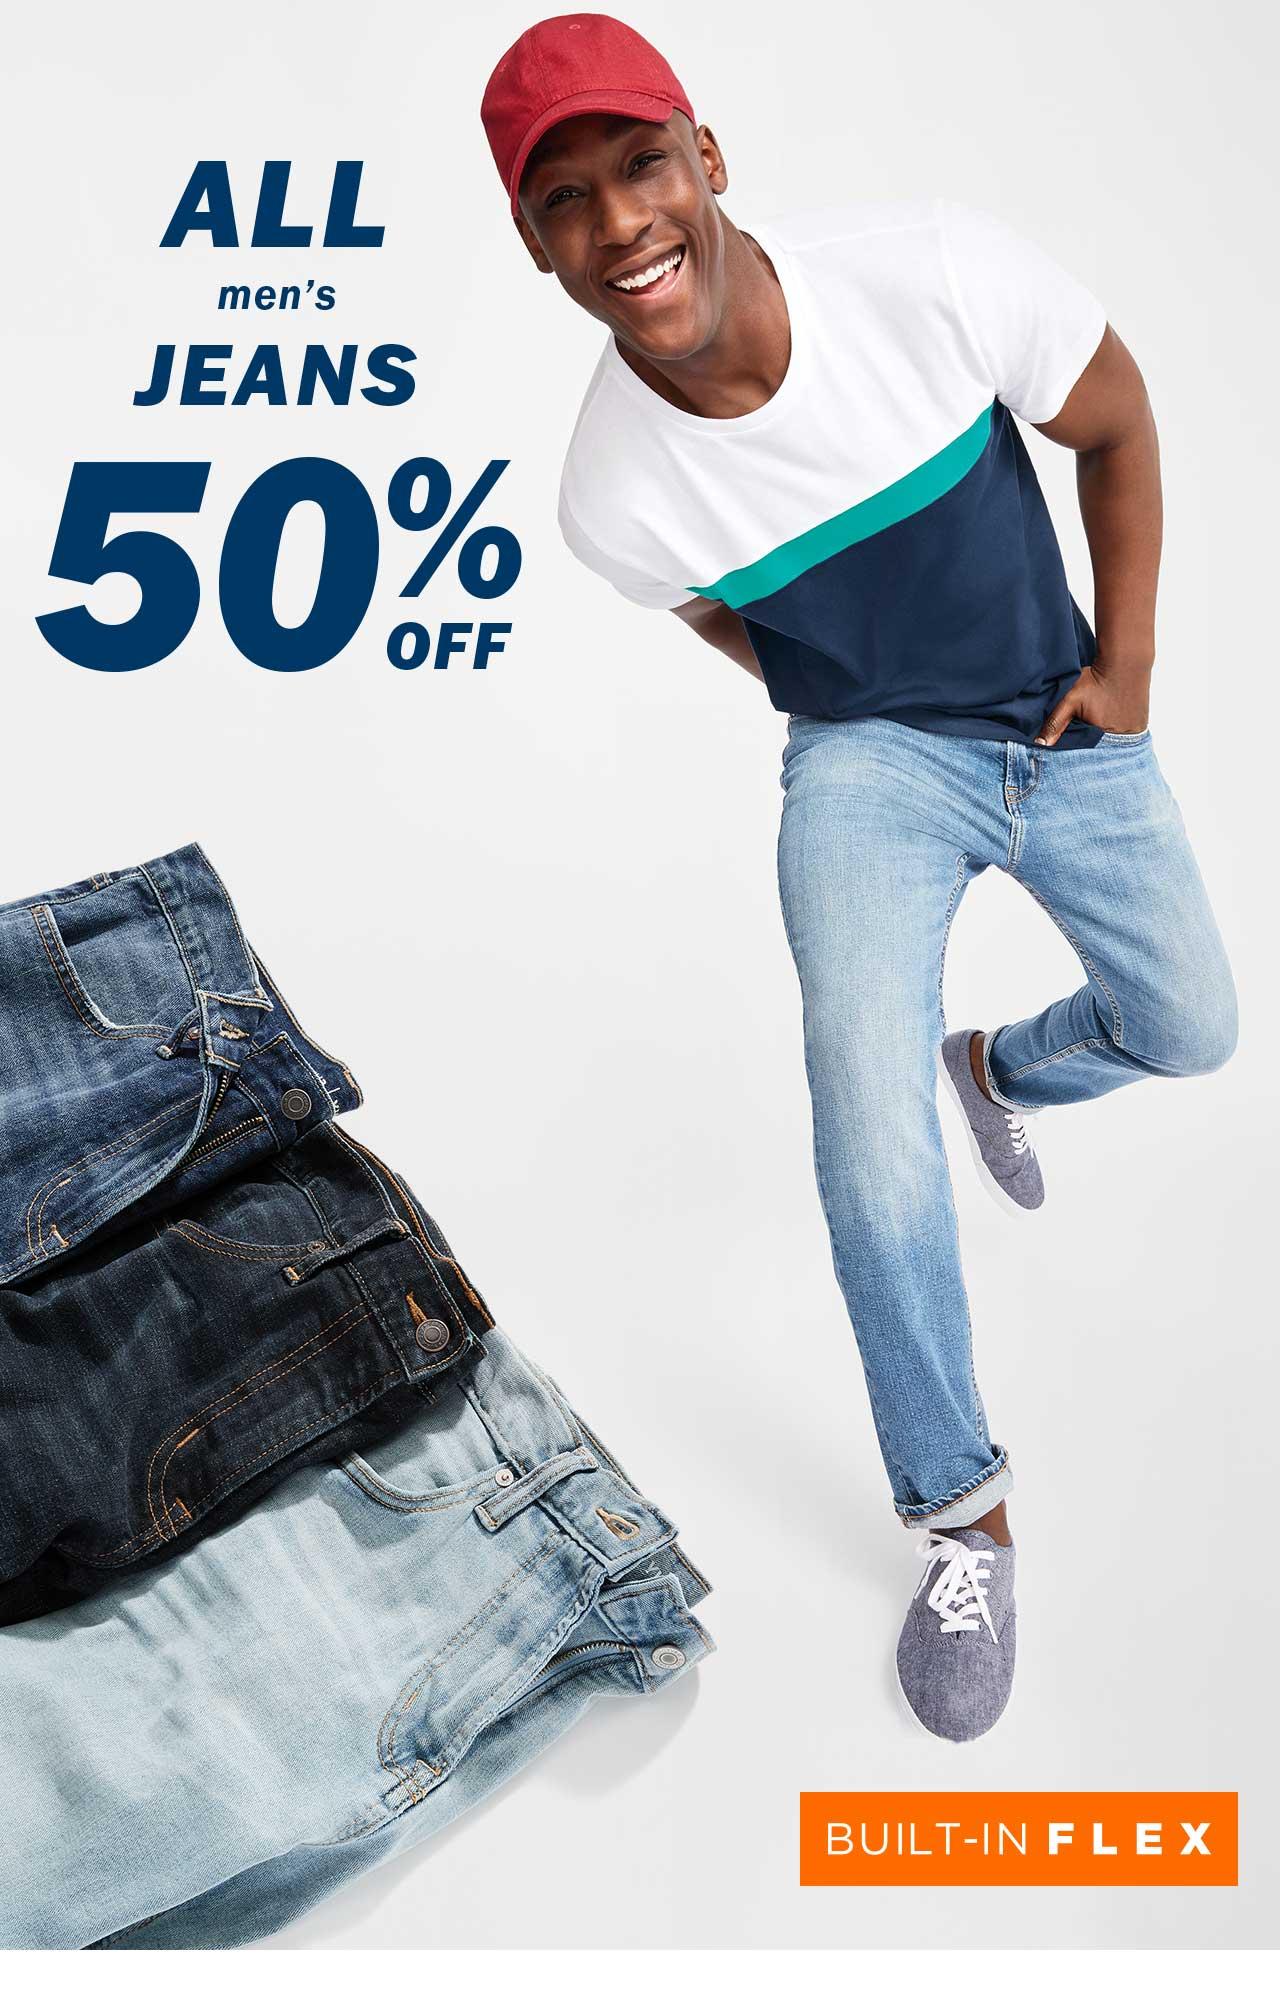 ALL men's JEANS 50% OFF